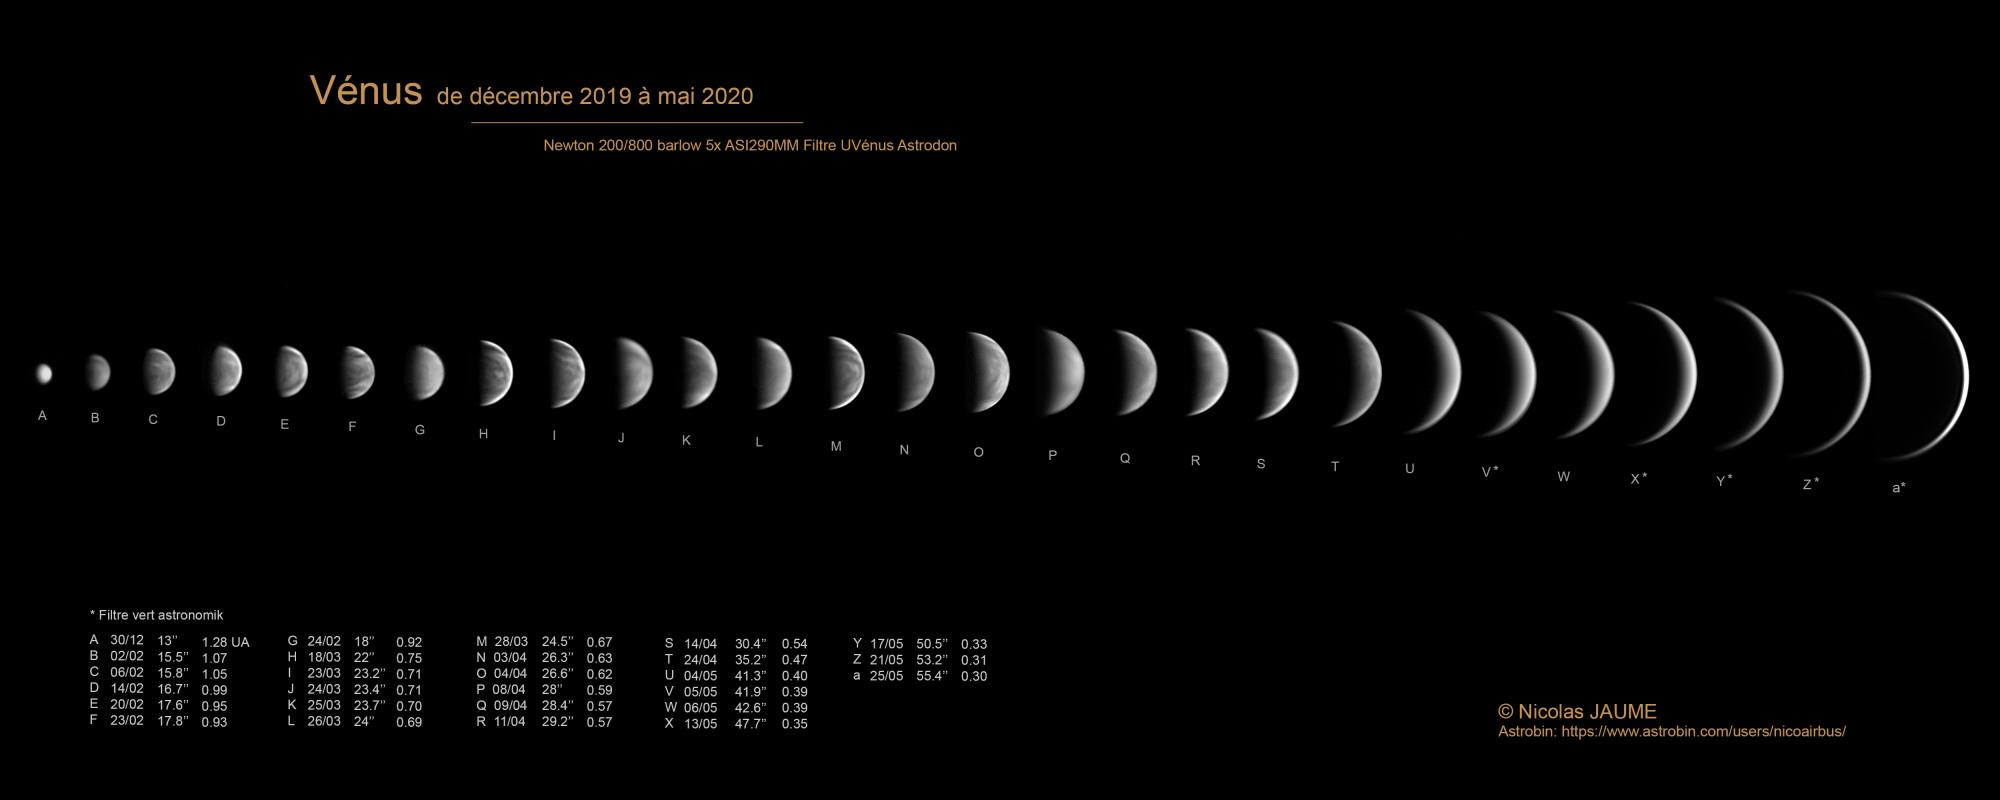 5ecbed50d6654_Planchefinalevenus2019-2020-N200-800V2.thumb.jpg.8c5fee596e364753380b02527678a443.jpg